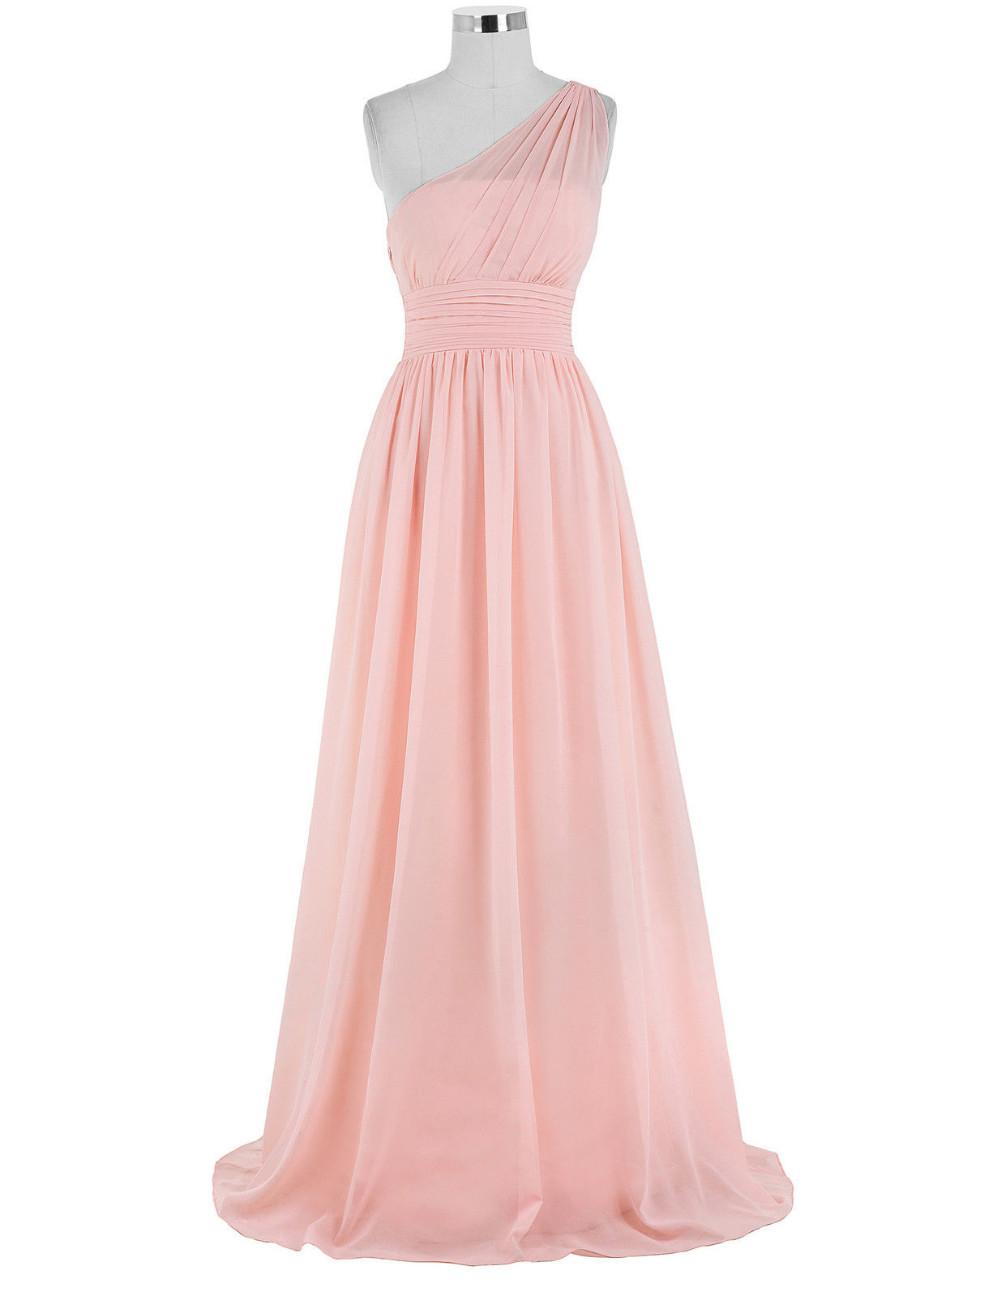 Kate Kasin Mint Green Bridesmaid Dresses Long Wedding Party Dresses One Shouler Bruidsmeisjes Jurk Pink Bridemaid Dress 0200 10